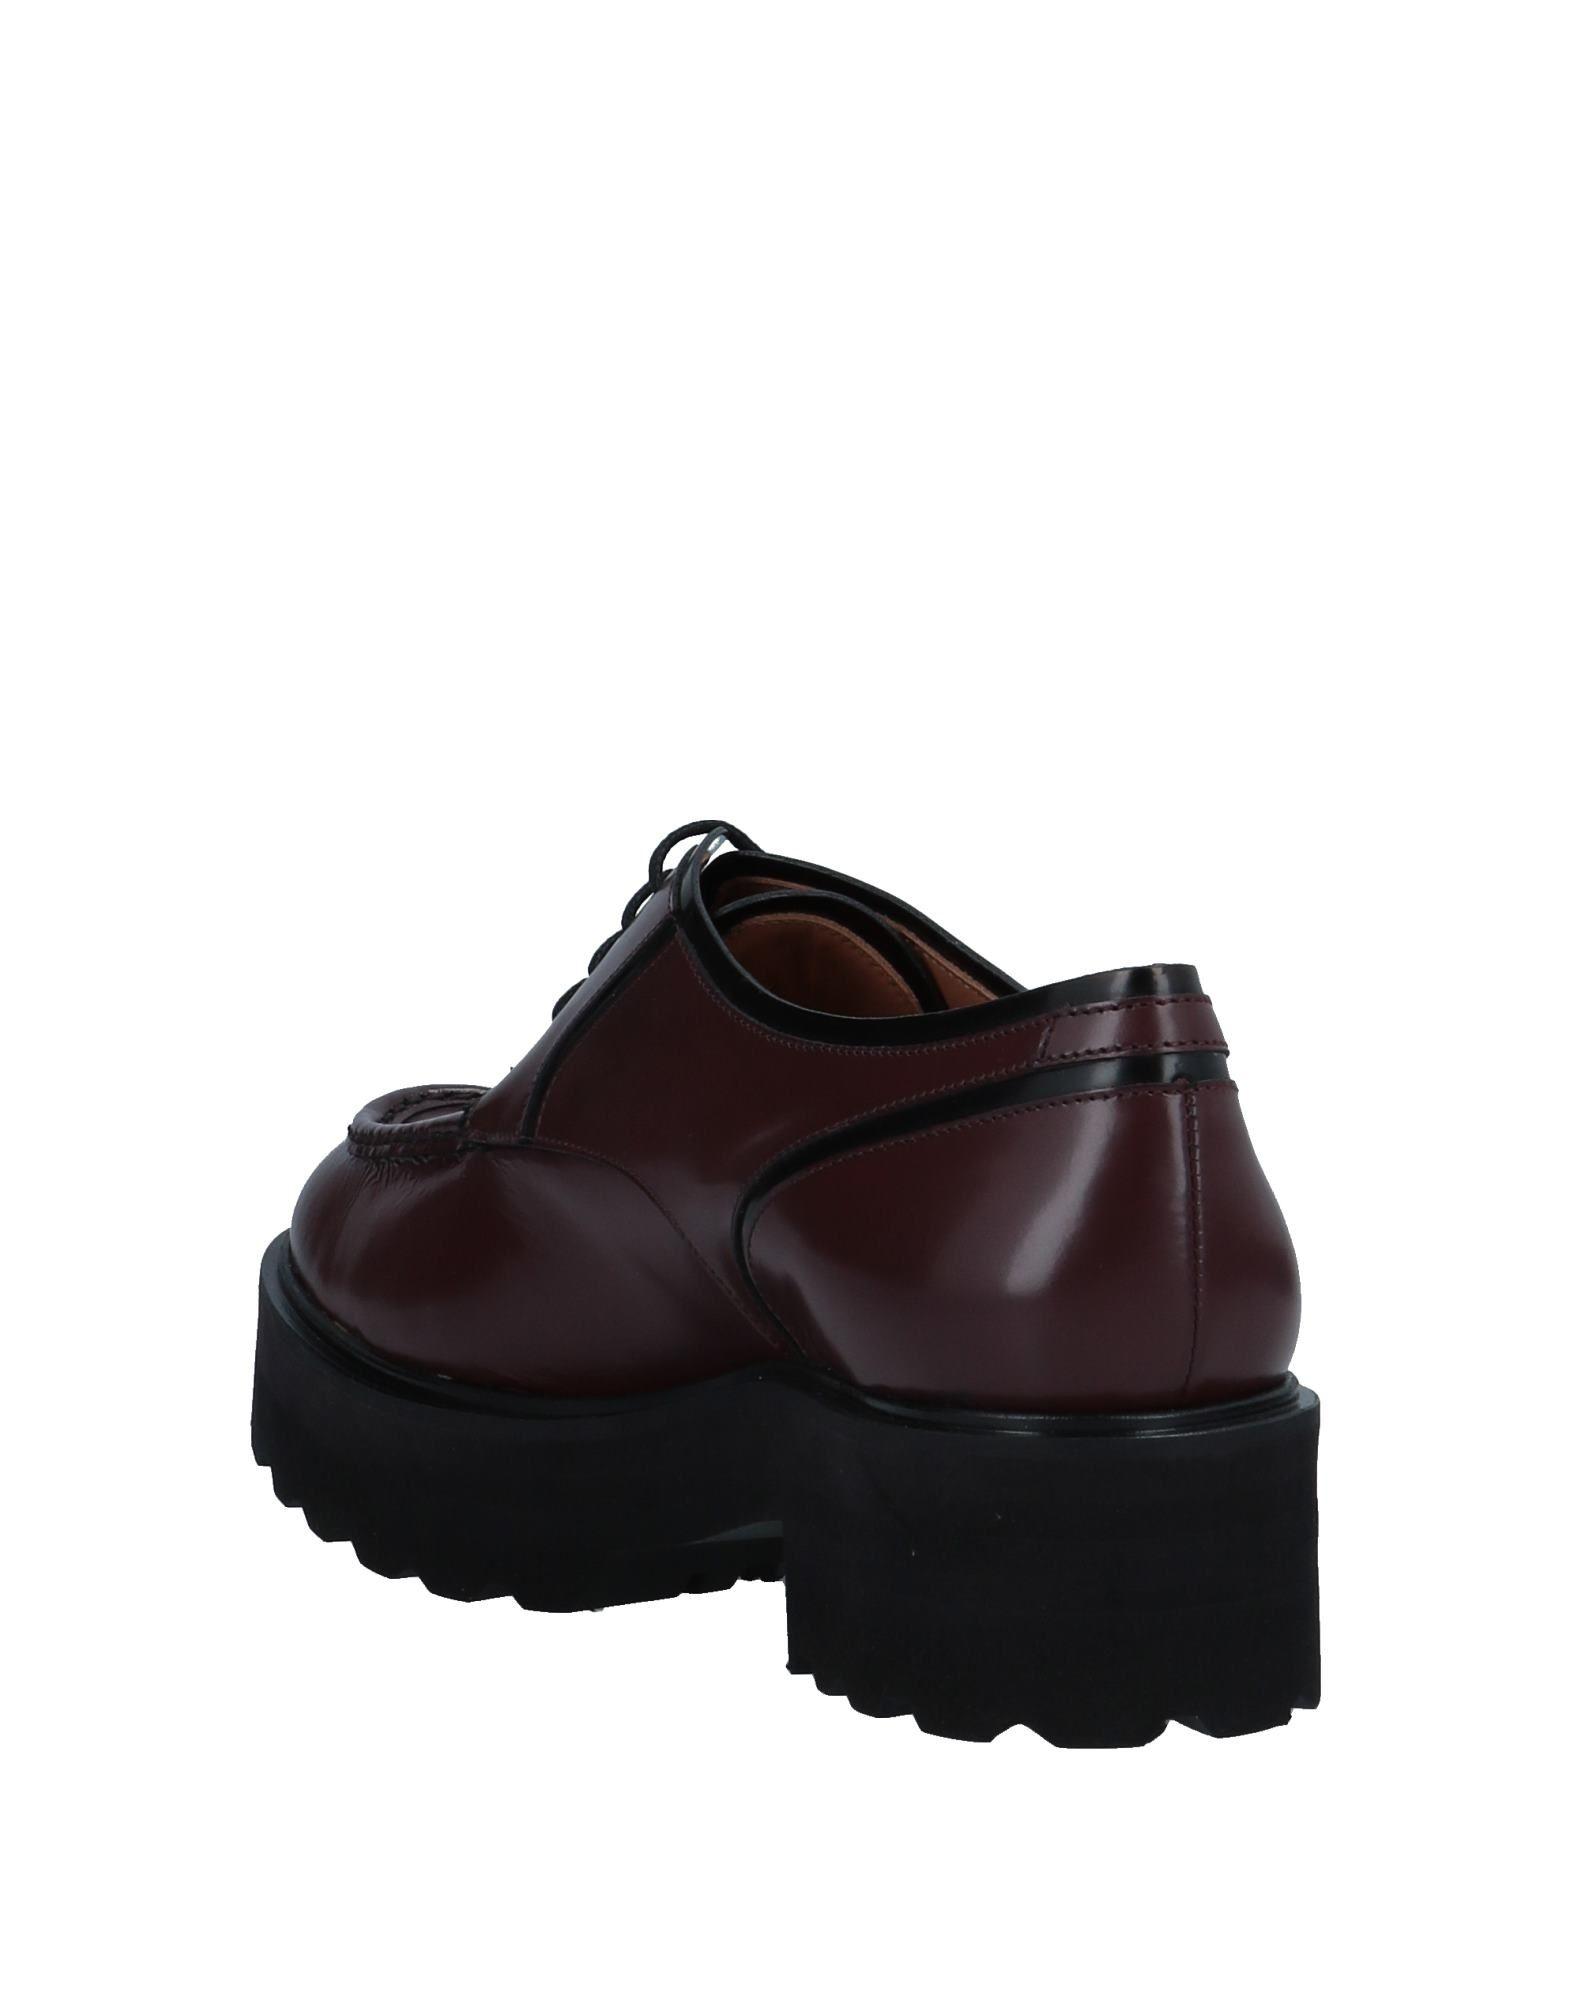 Rabatt Schuhe Schnürschuhe Fratelli Rossetti Schnürschuhe Schuhe Damen  11548363GH 41cd68